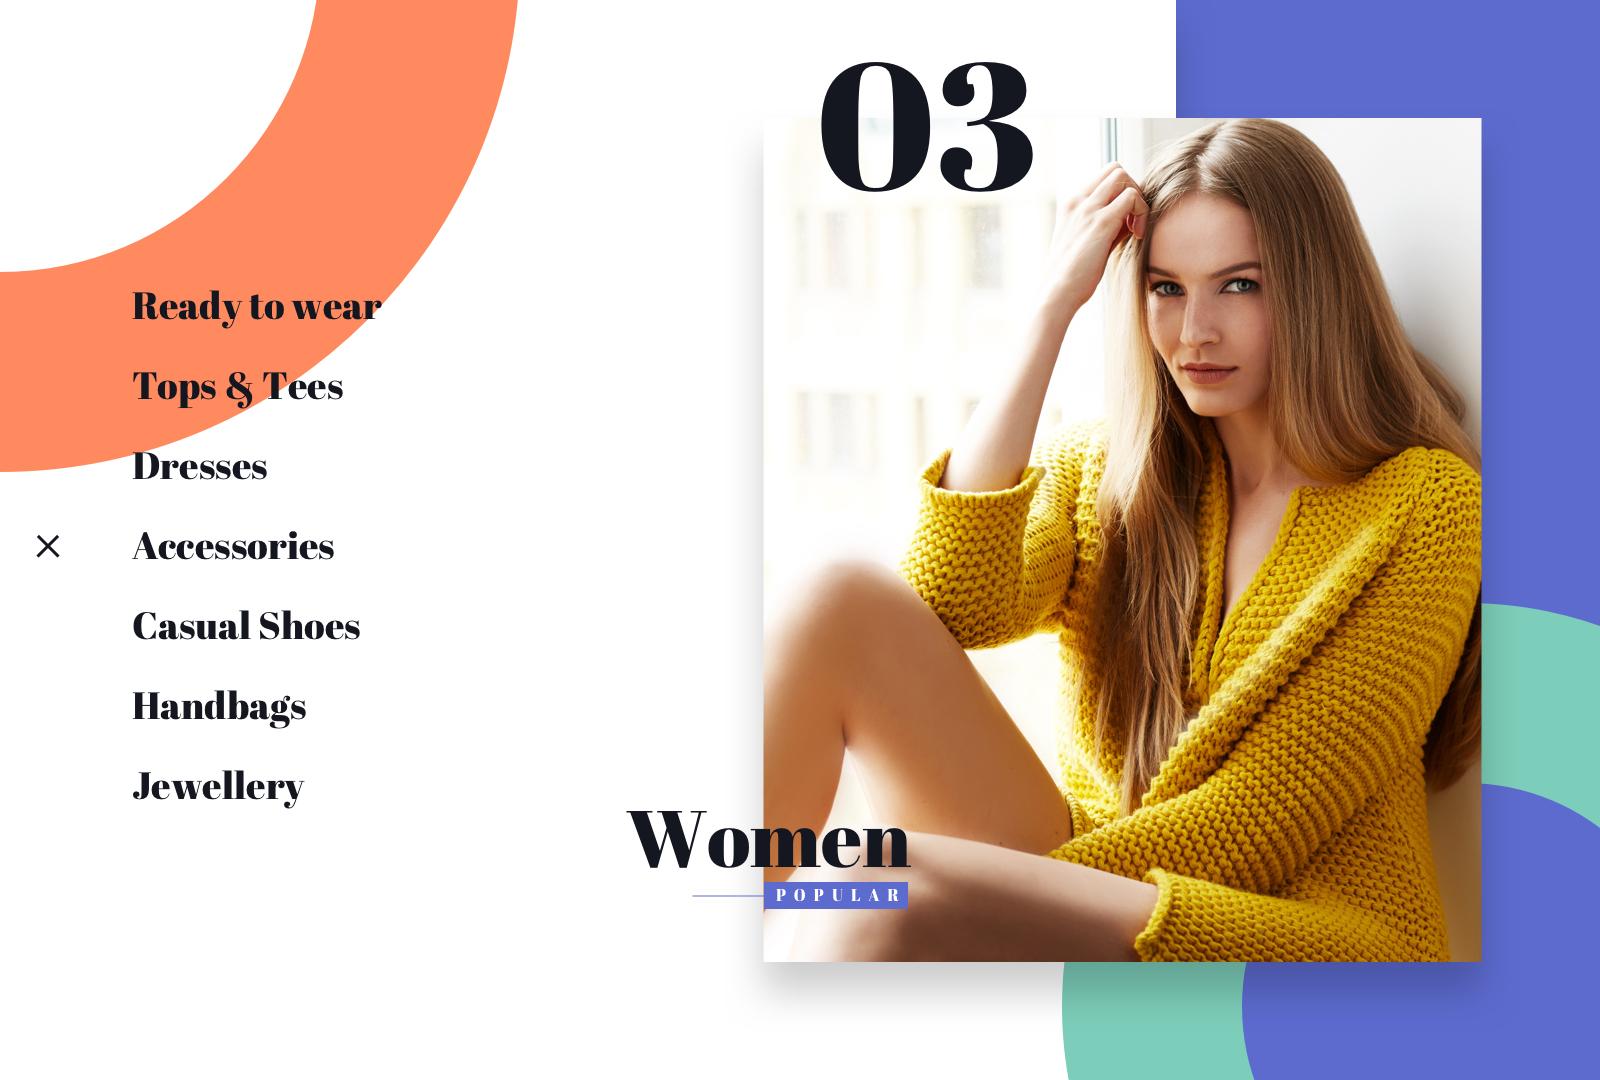 Women categories